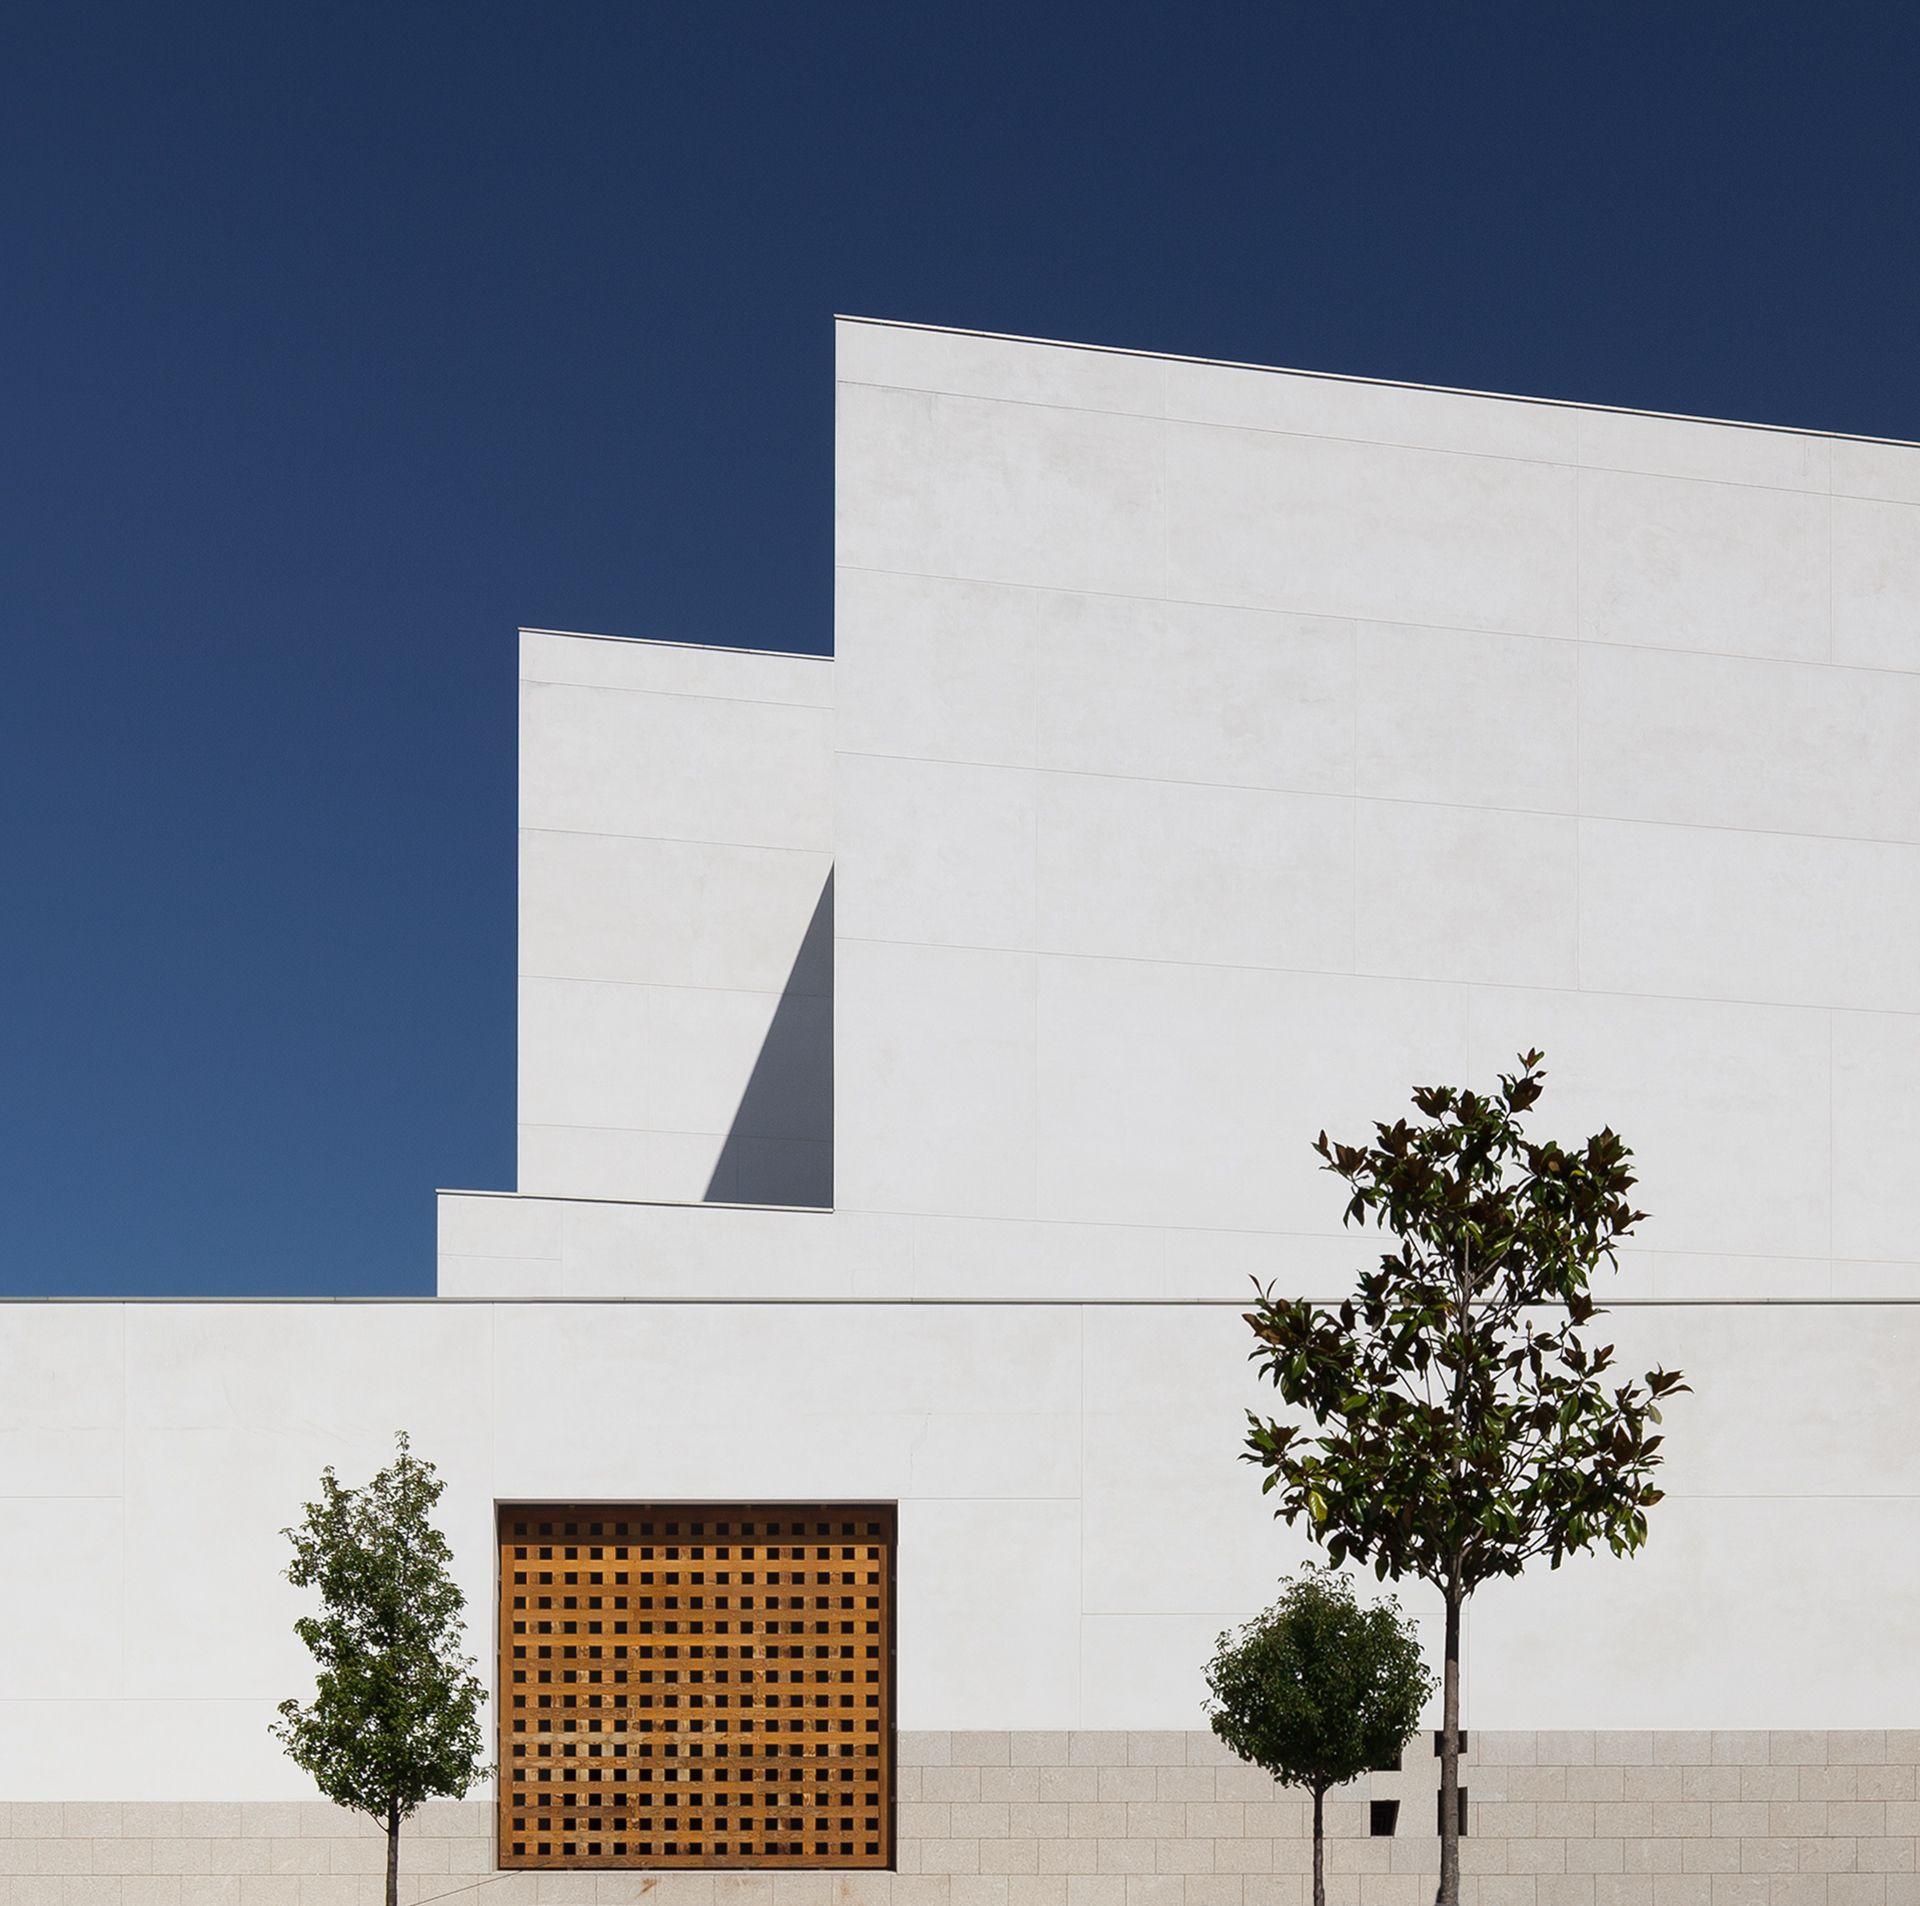 IGLESIA IESU, SAN SEBASTIÁN, SPAIN | Rubén P. Bescós. Fotógrafo de Arquitectura en Barcelona – Madrid – New York – London – Architekturfotograf – 建筑摄影师